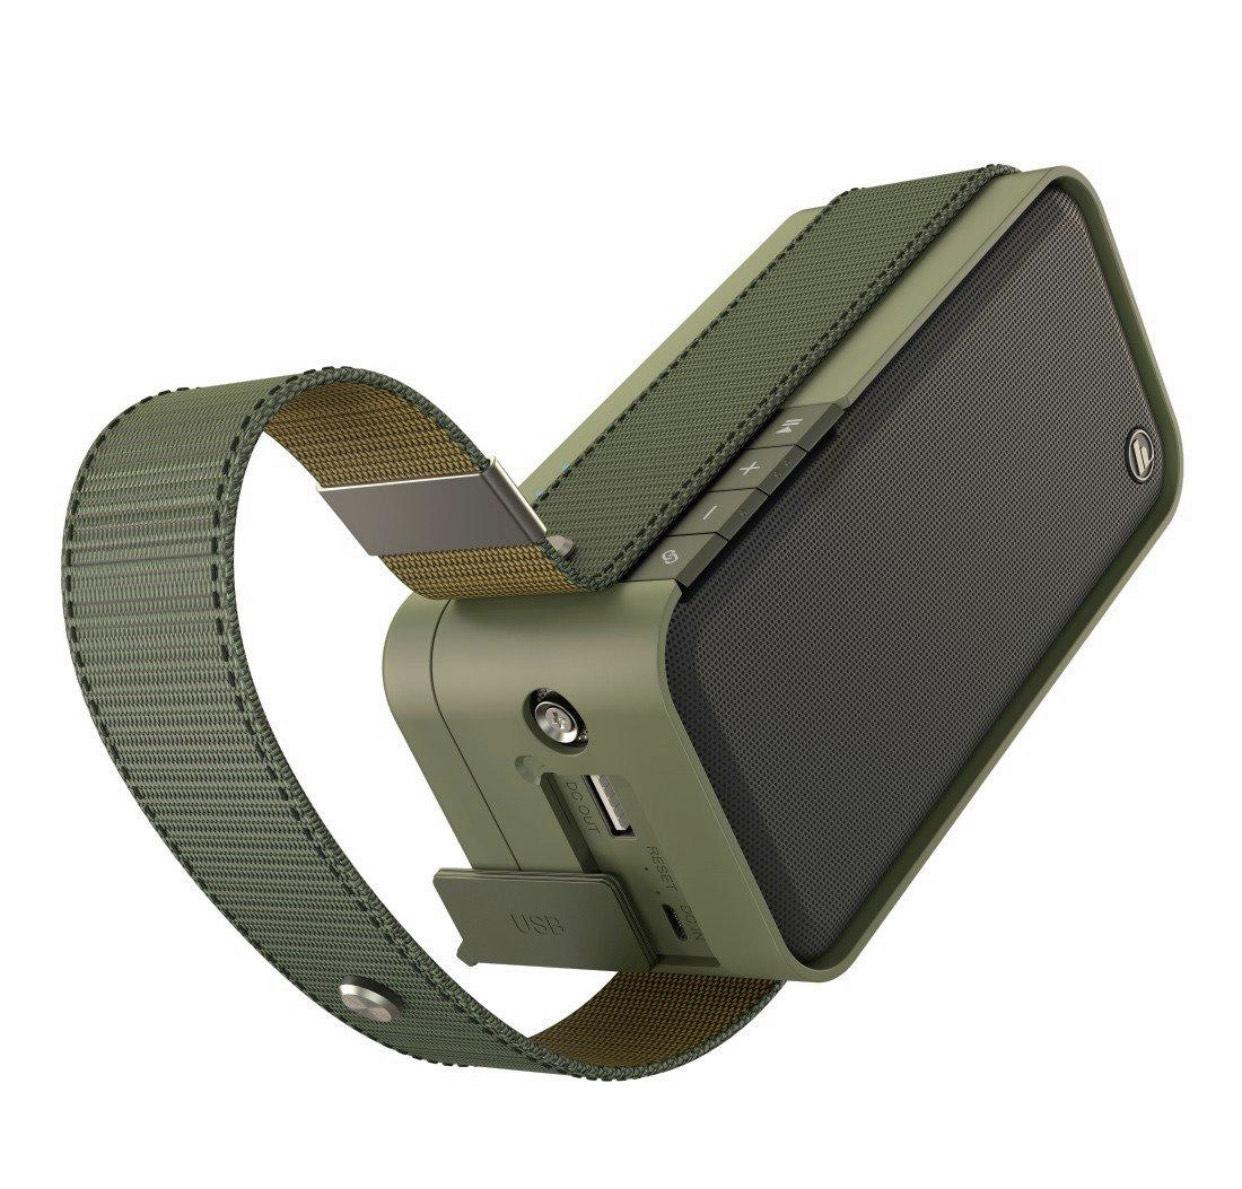 Hama Soldier-L Mobile Bluetooth Speaker